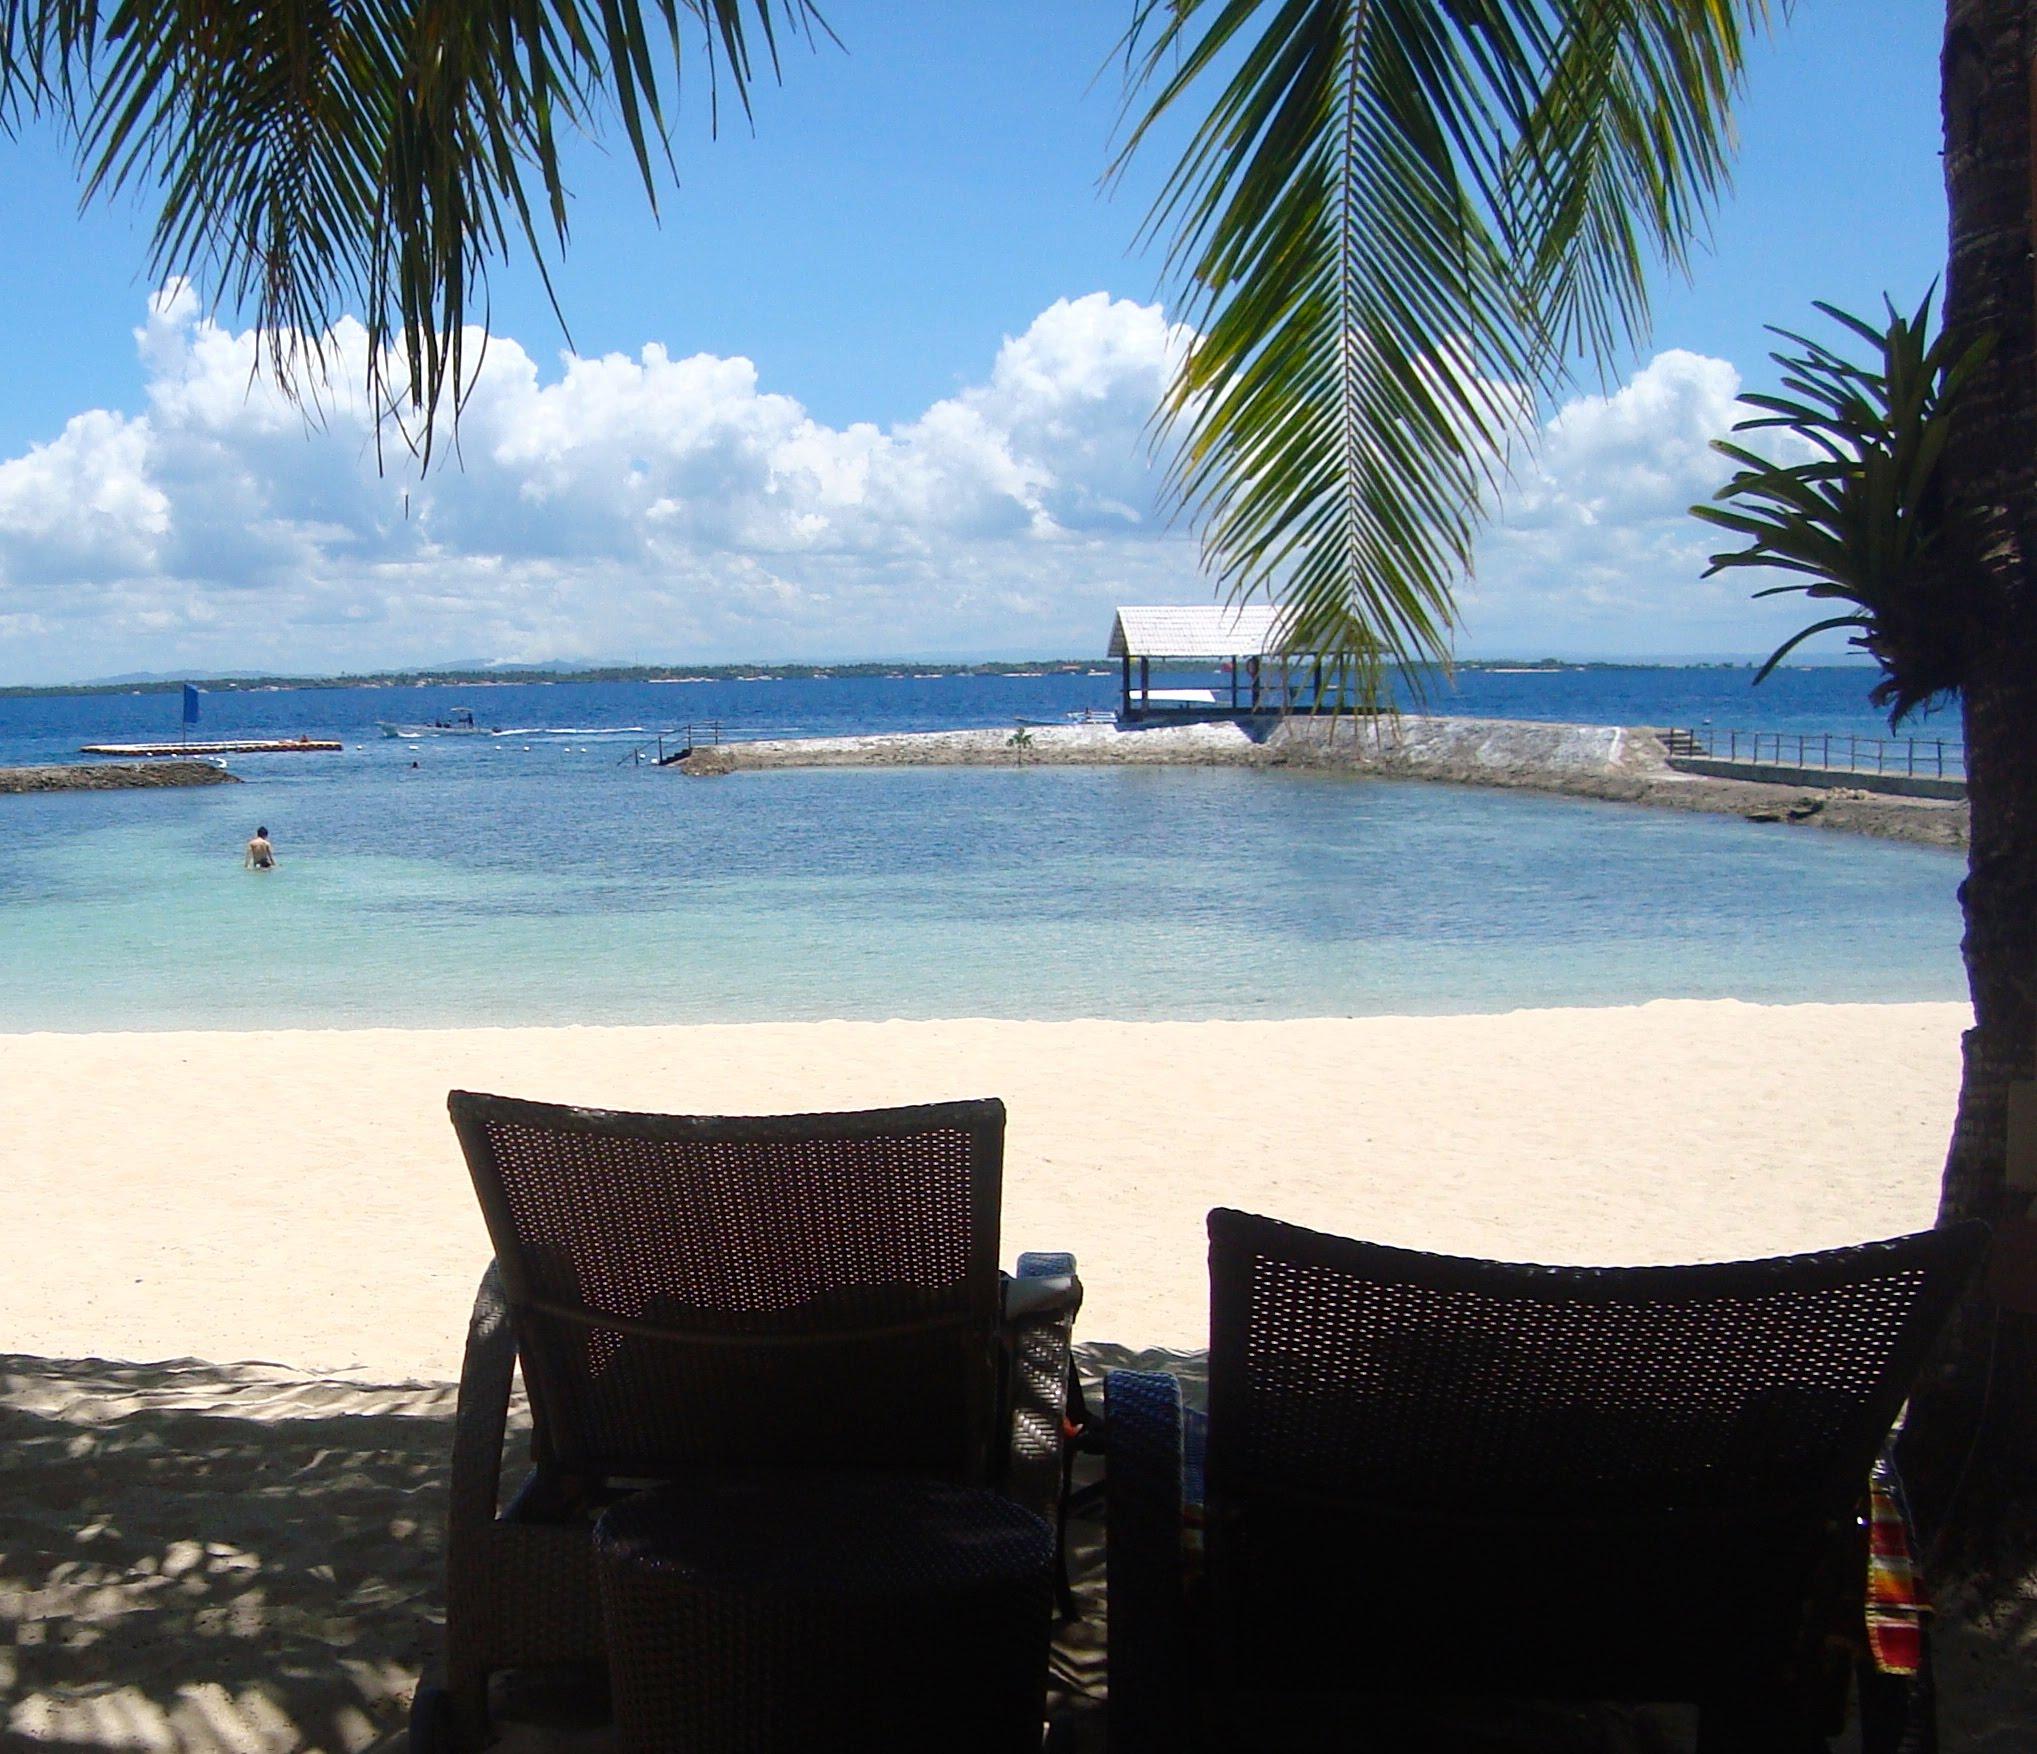 COSTABELLA Tropical Beach Hotel Mactan Cebu,Philippines.